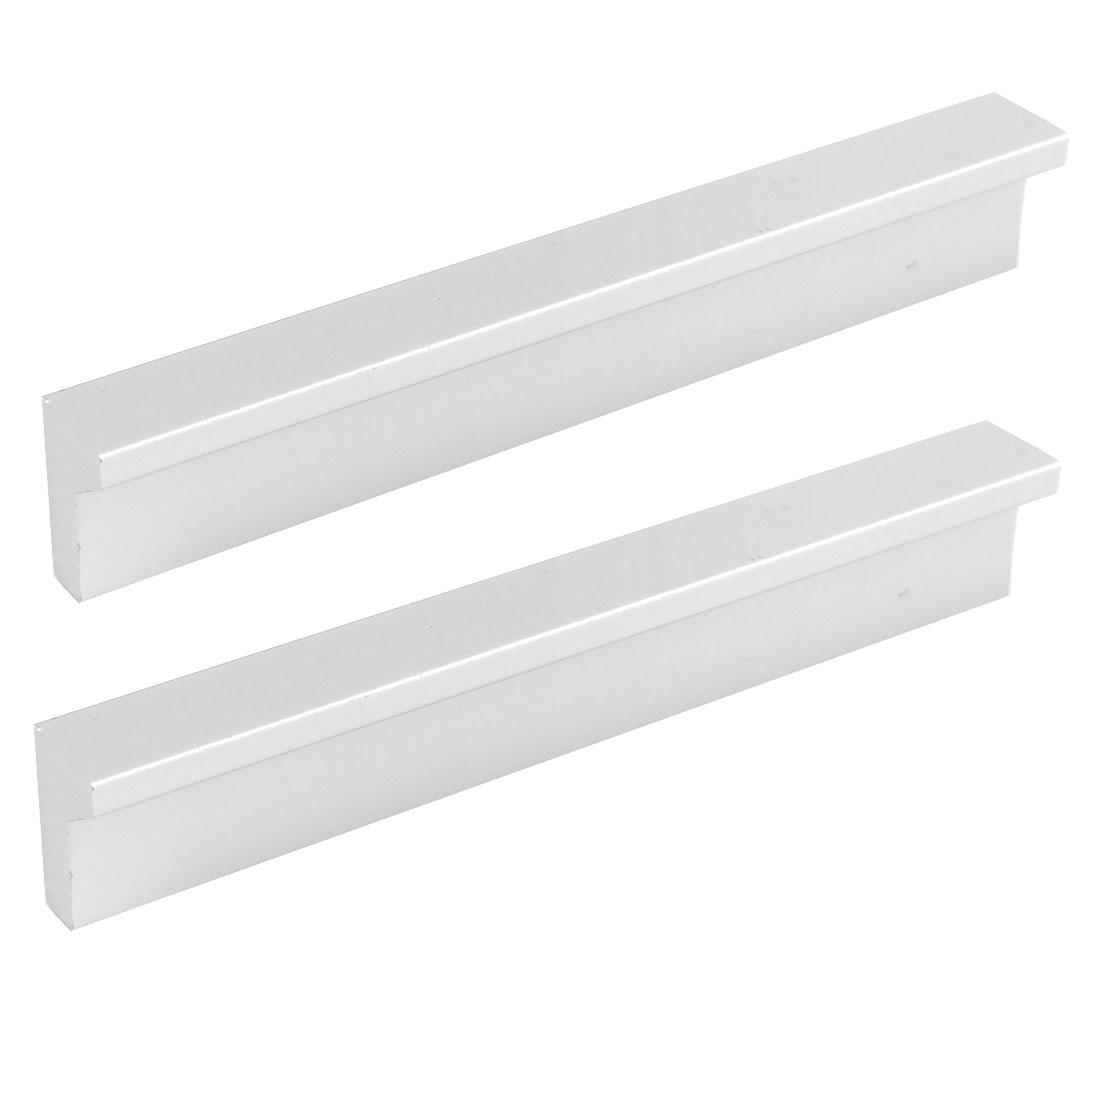 Furniture Cabinet Drawer Aluminum Alloy Pull Bar Handle 96mm Silver Tone 2pcs